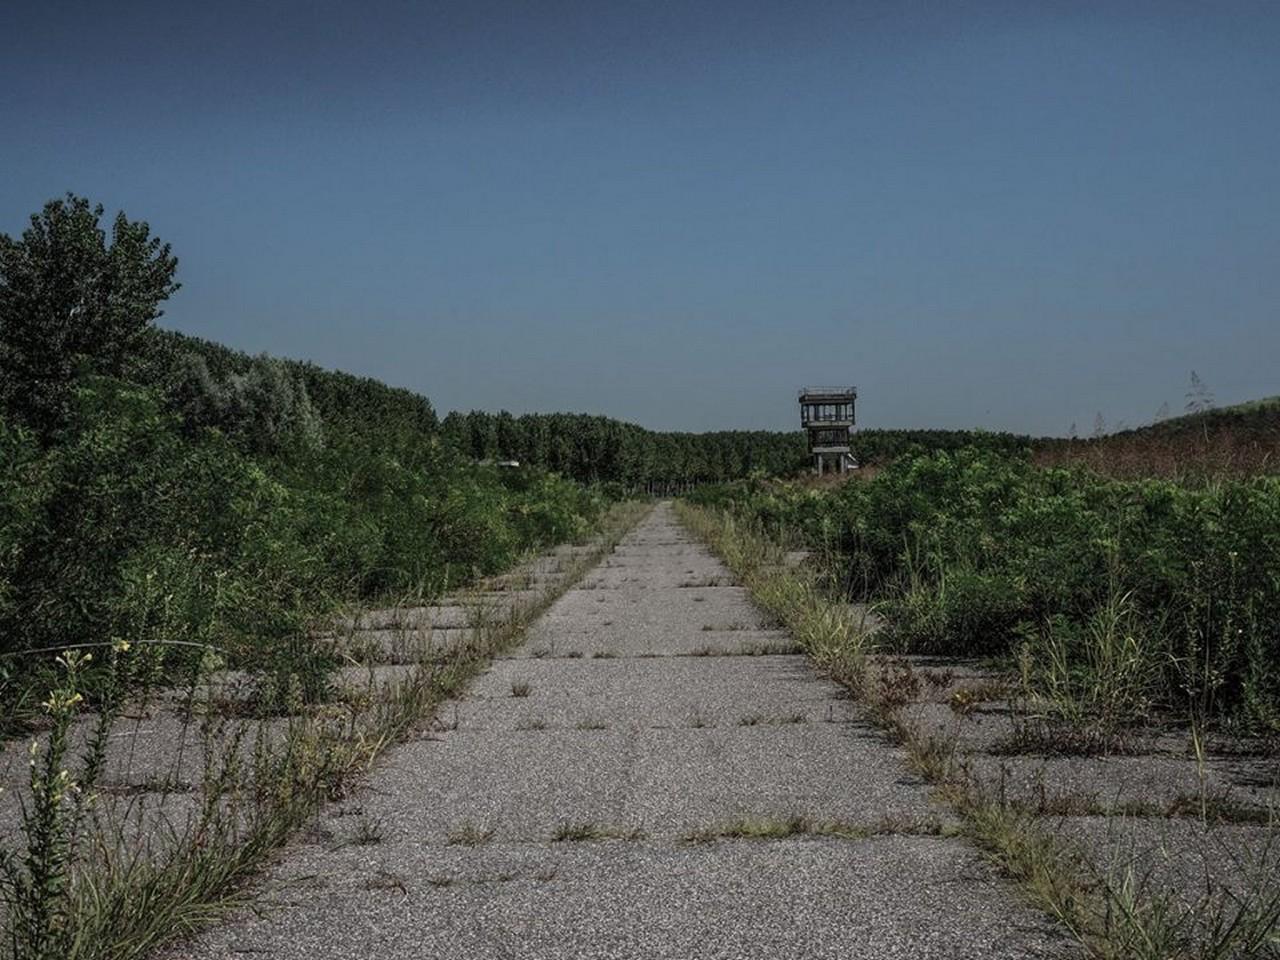 circuito de Casale Monferrato (3)